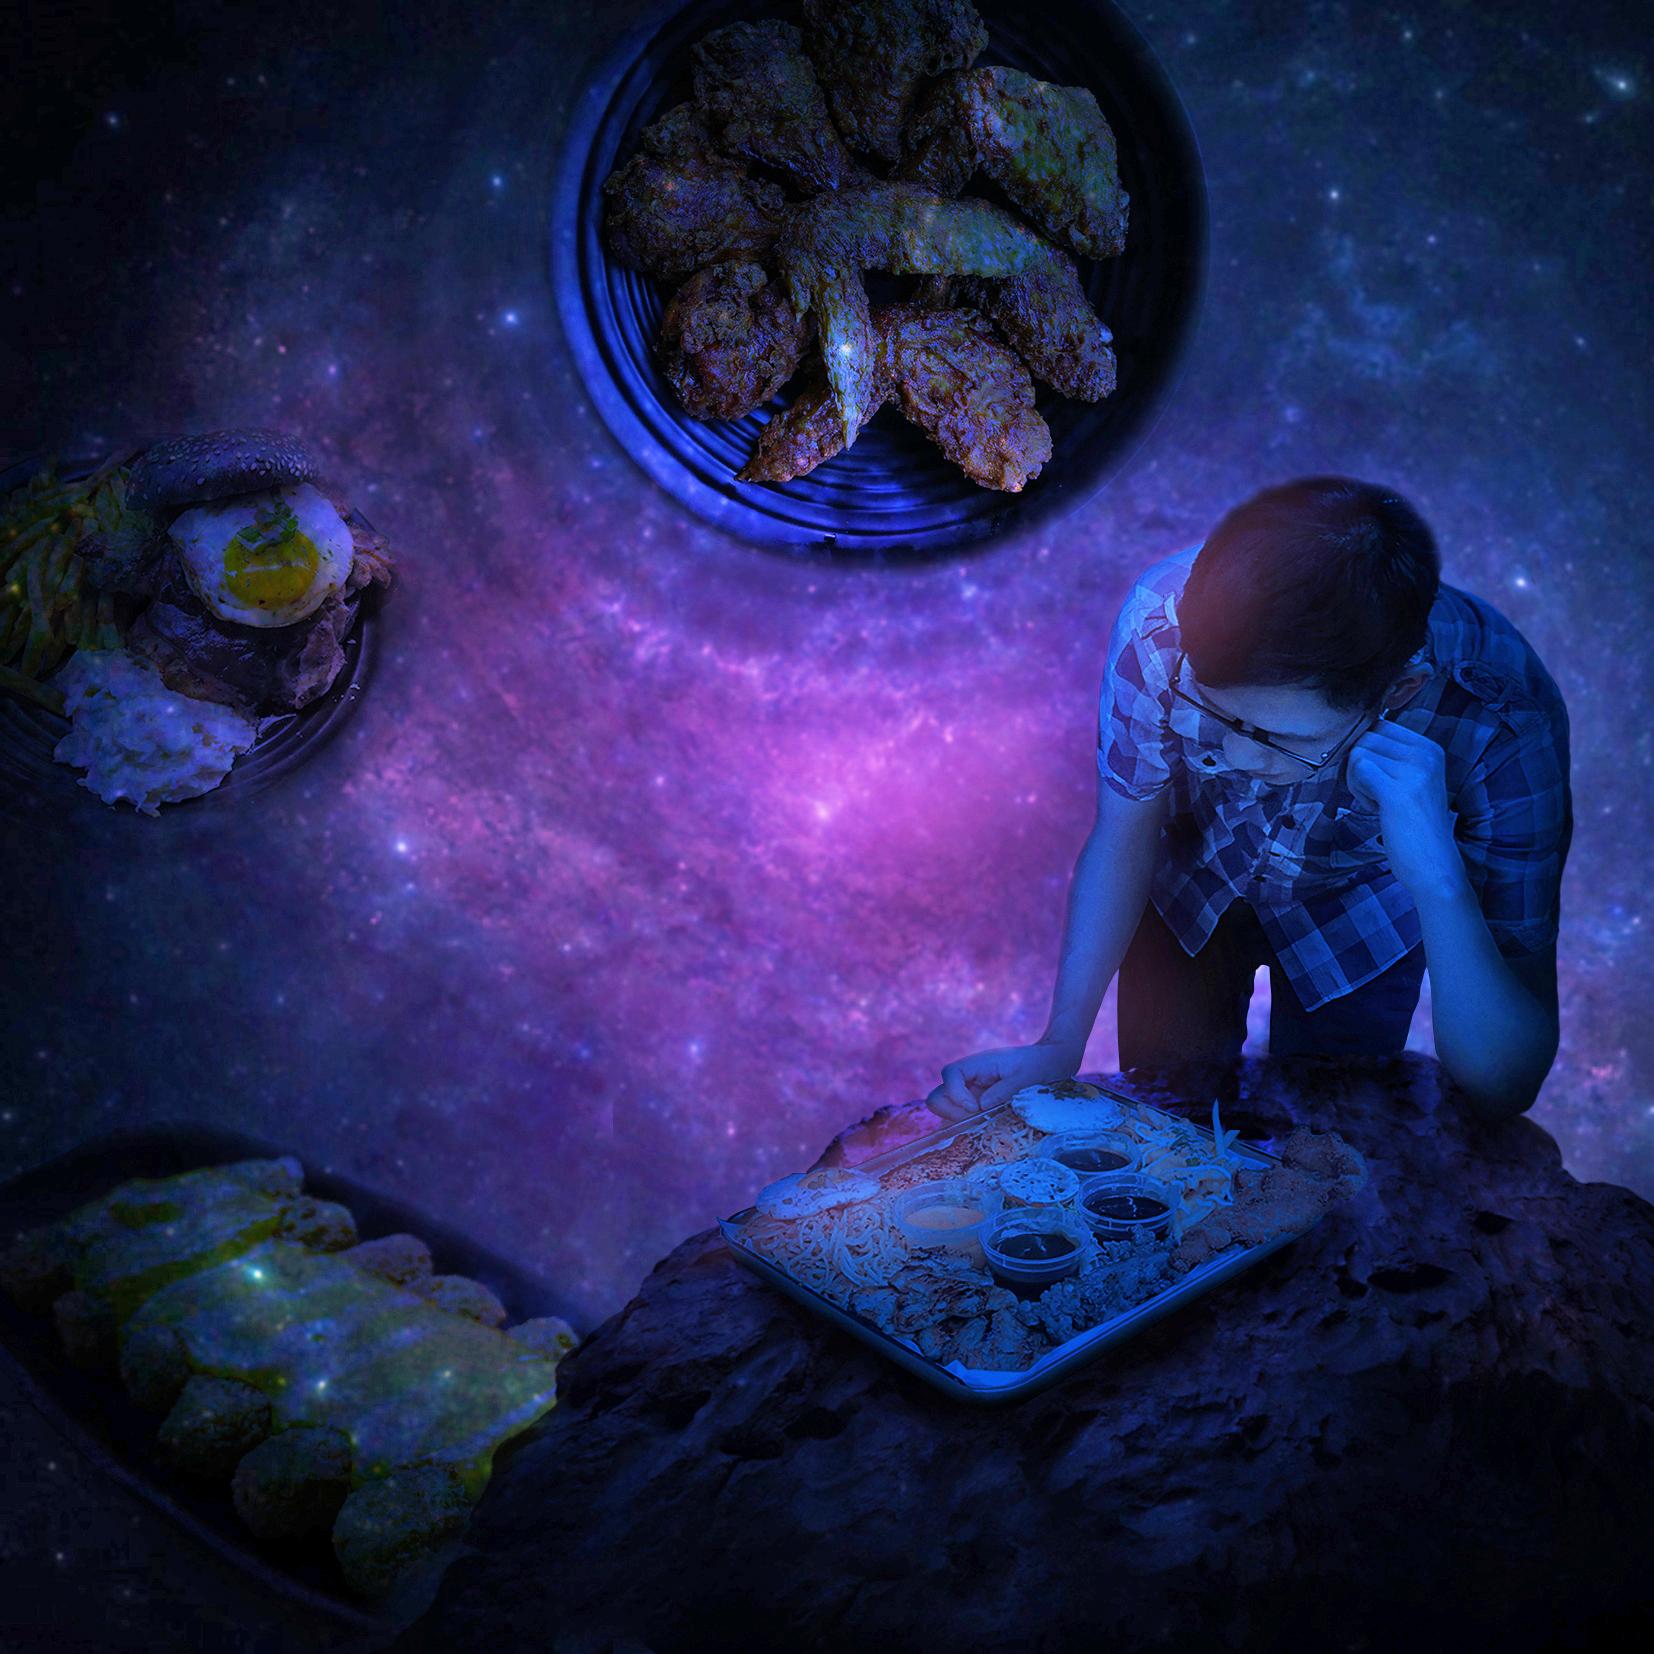 Spacial Dream Digital Art by Alvin Sim